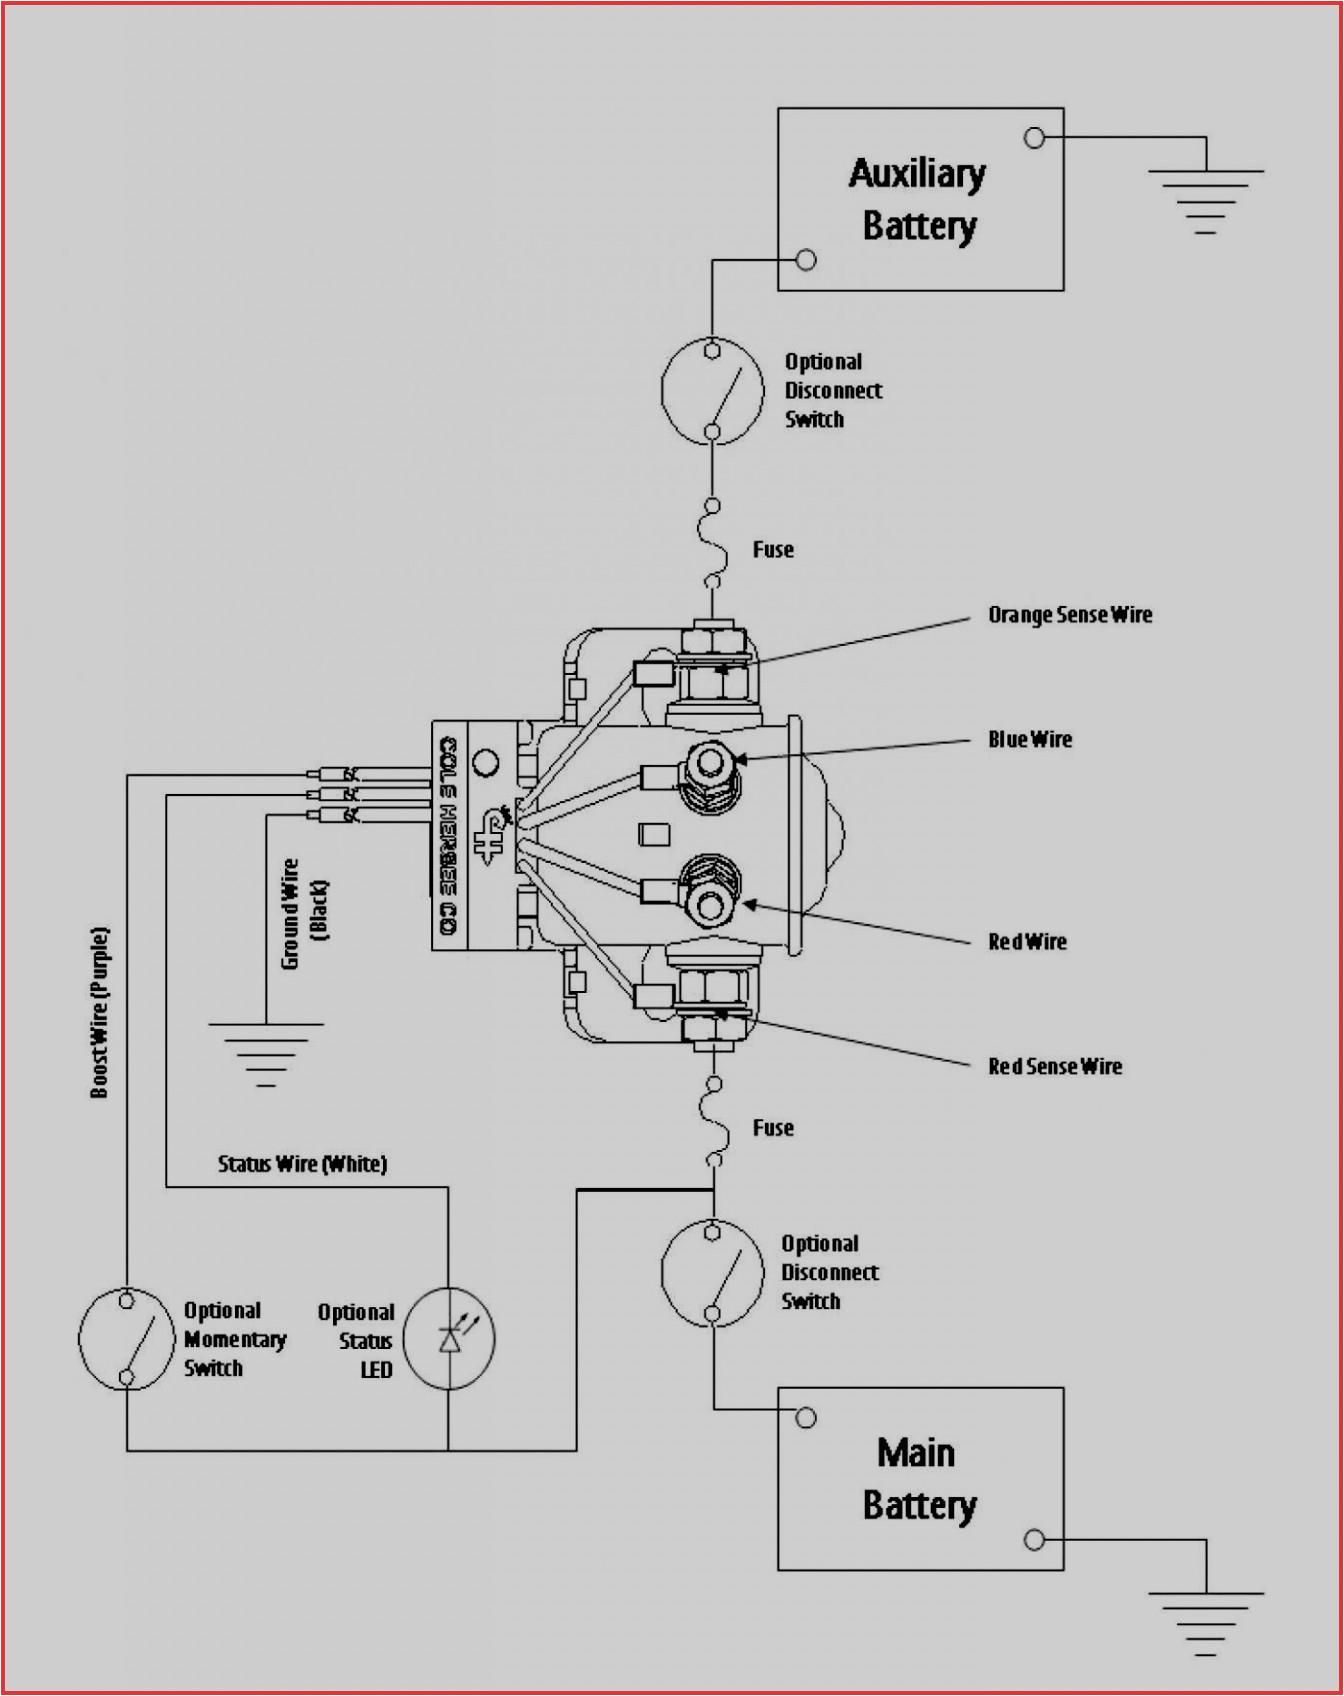 E46 Wiring Diagram Download Bmw Wiring Diagram E90 Manual E Book